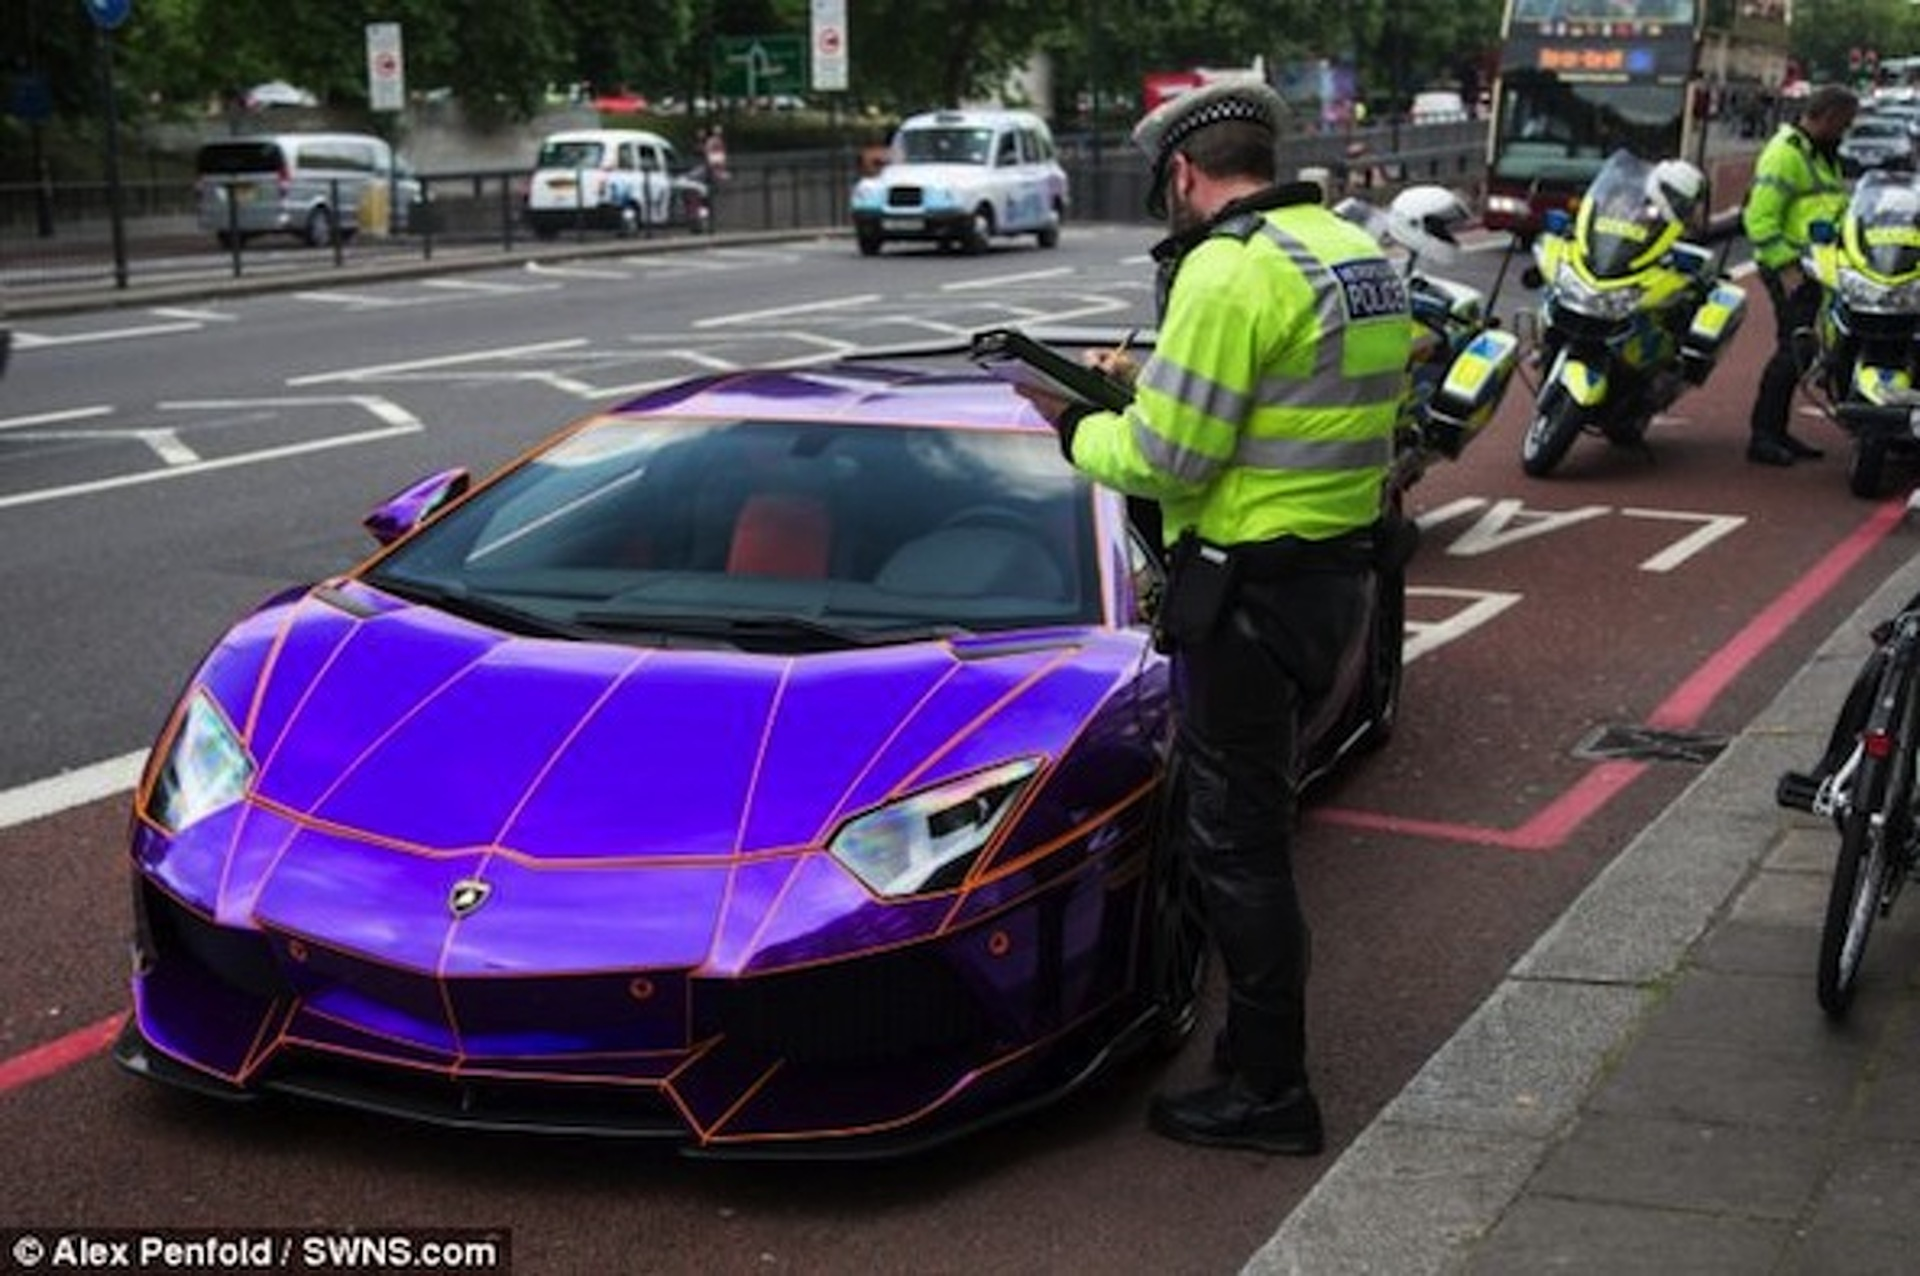 'Glow in the Dark' Lamborghini Seized by London Police [UPDATE] [w/video]